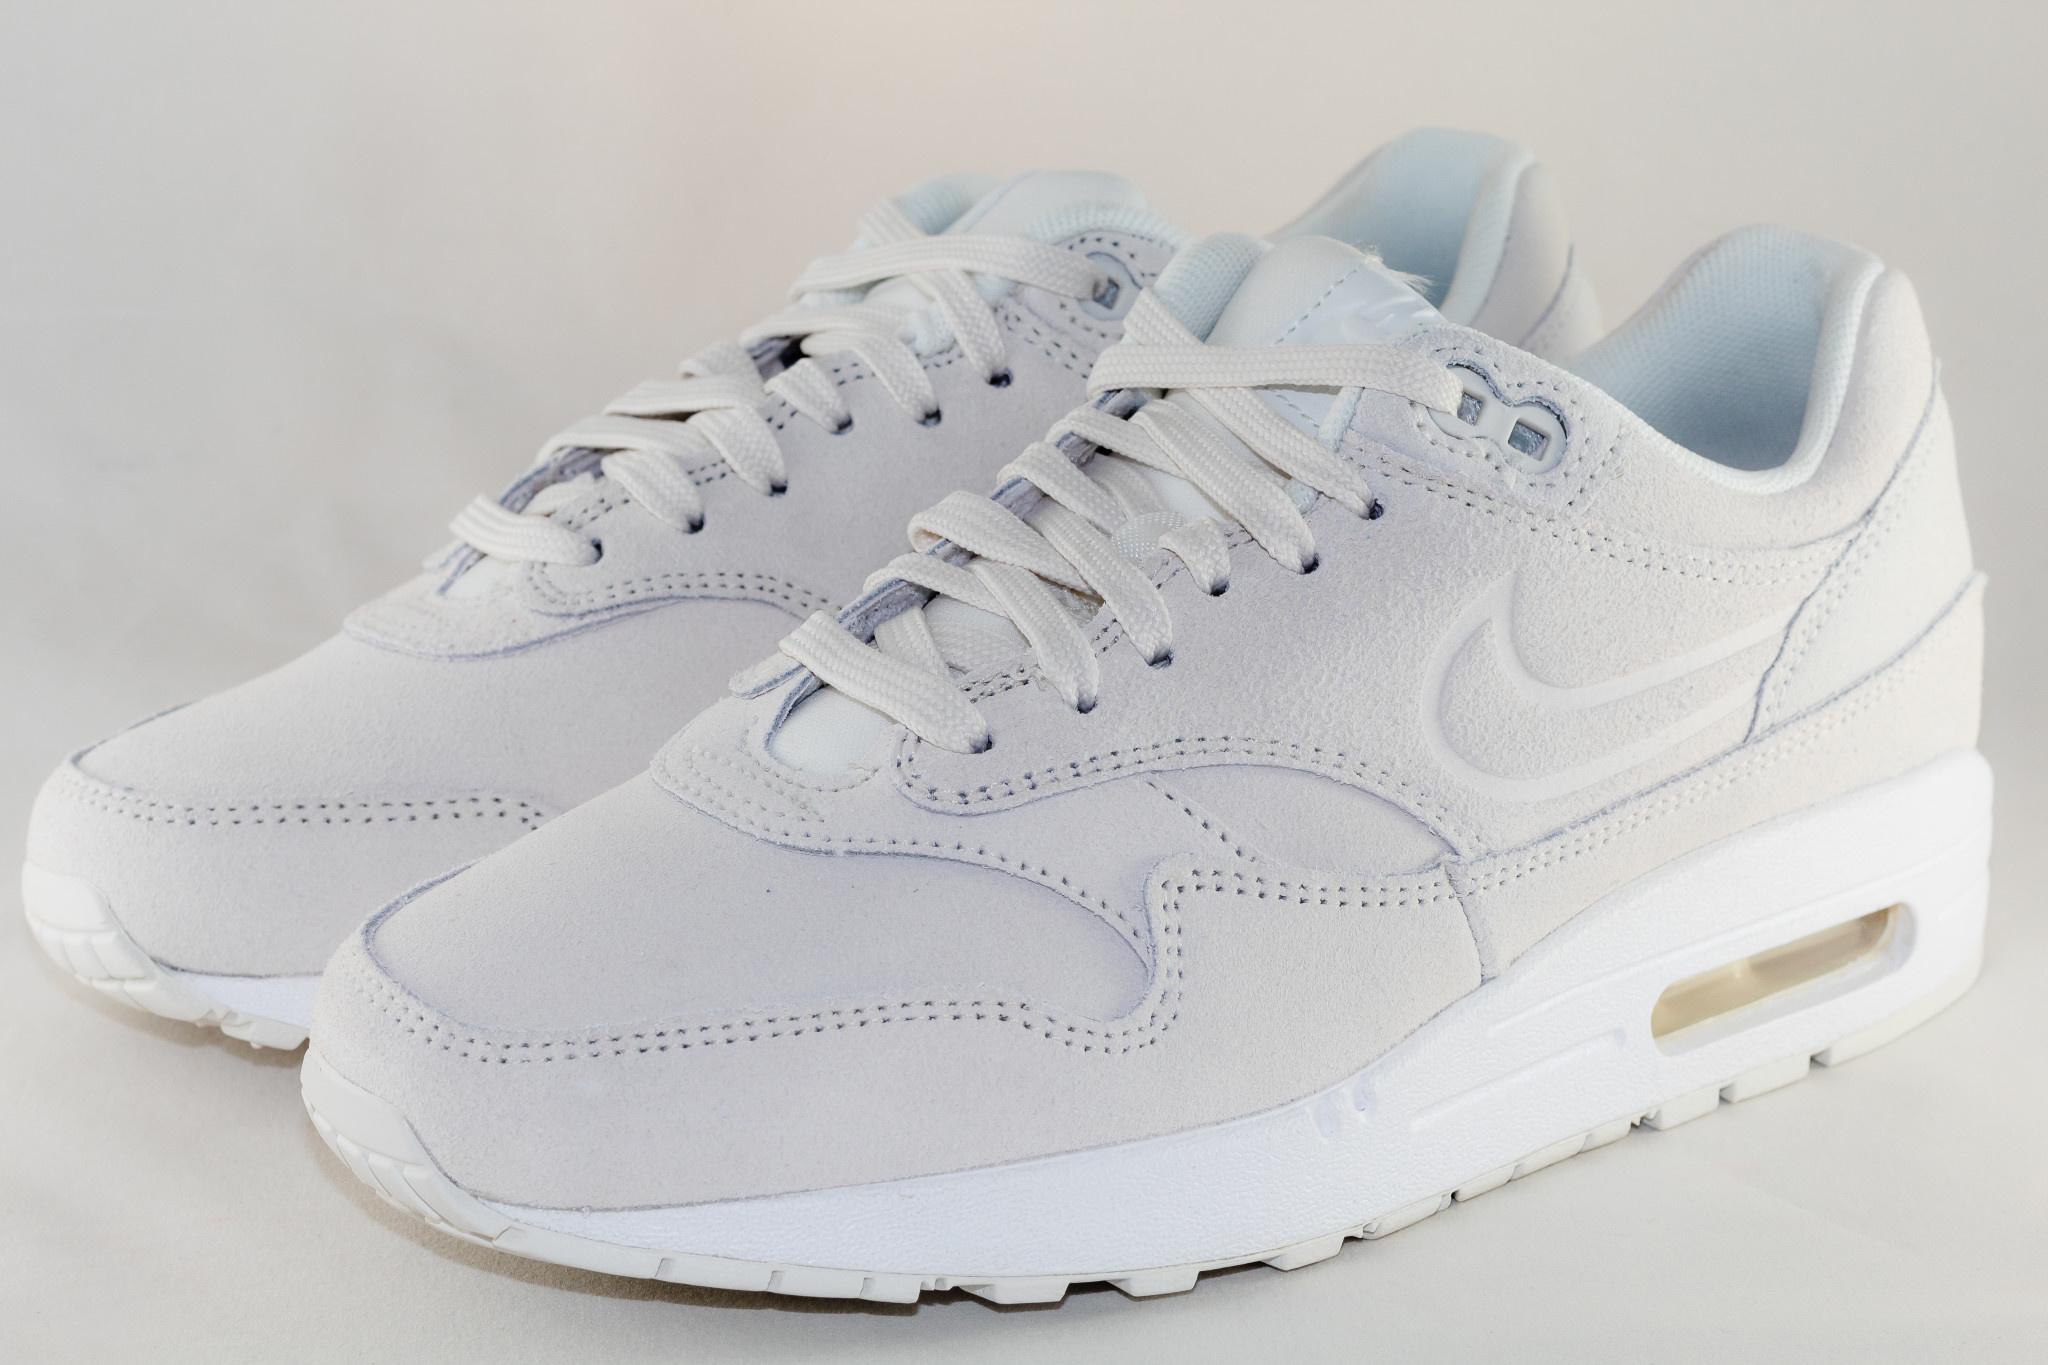 Nike AIR MAX 1 Summit White/ Summit White